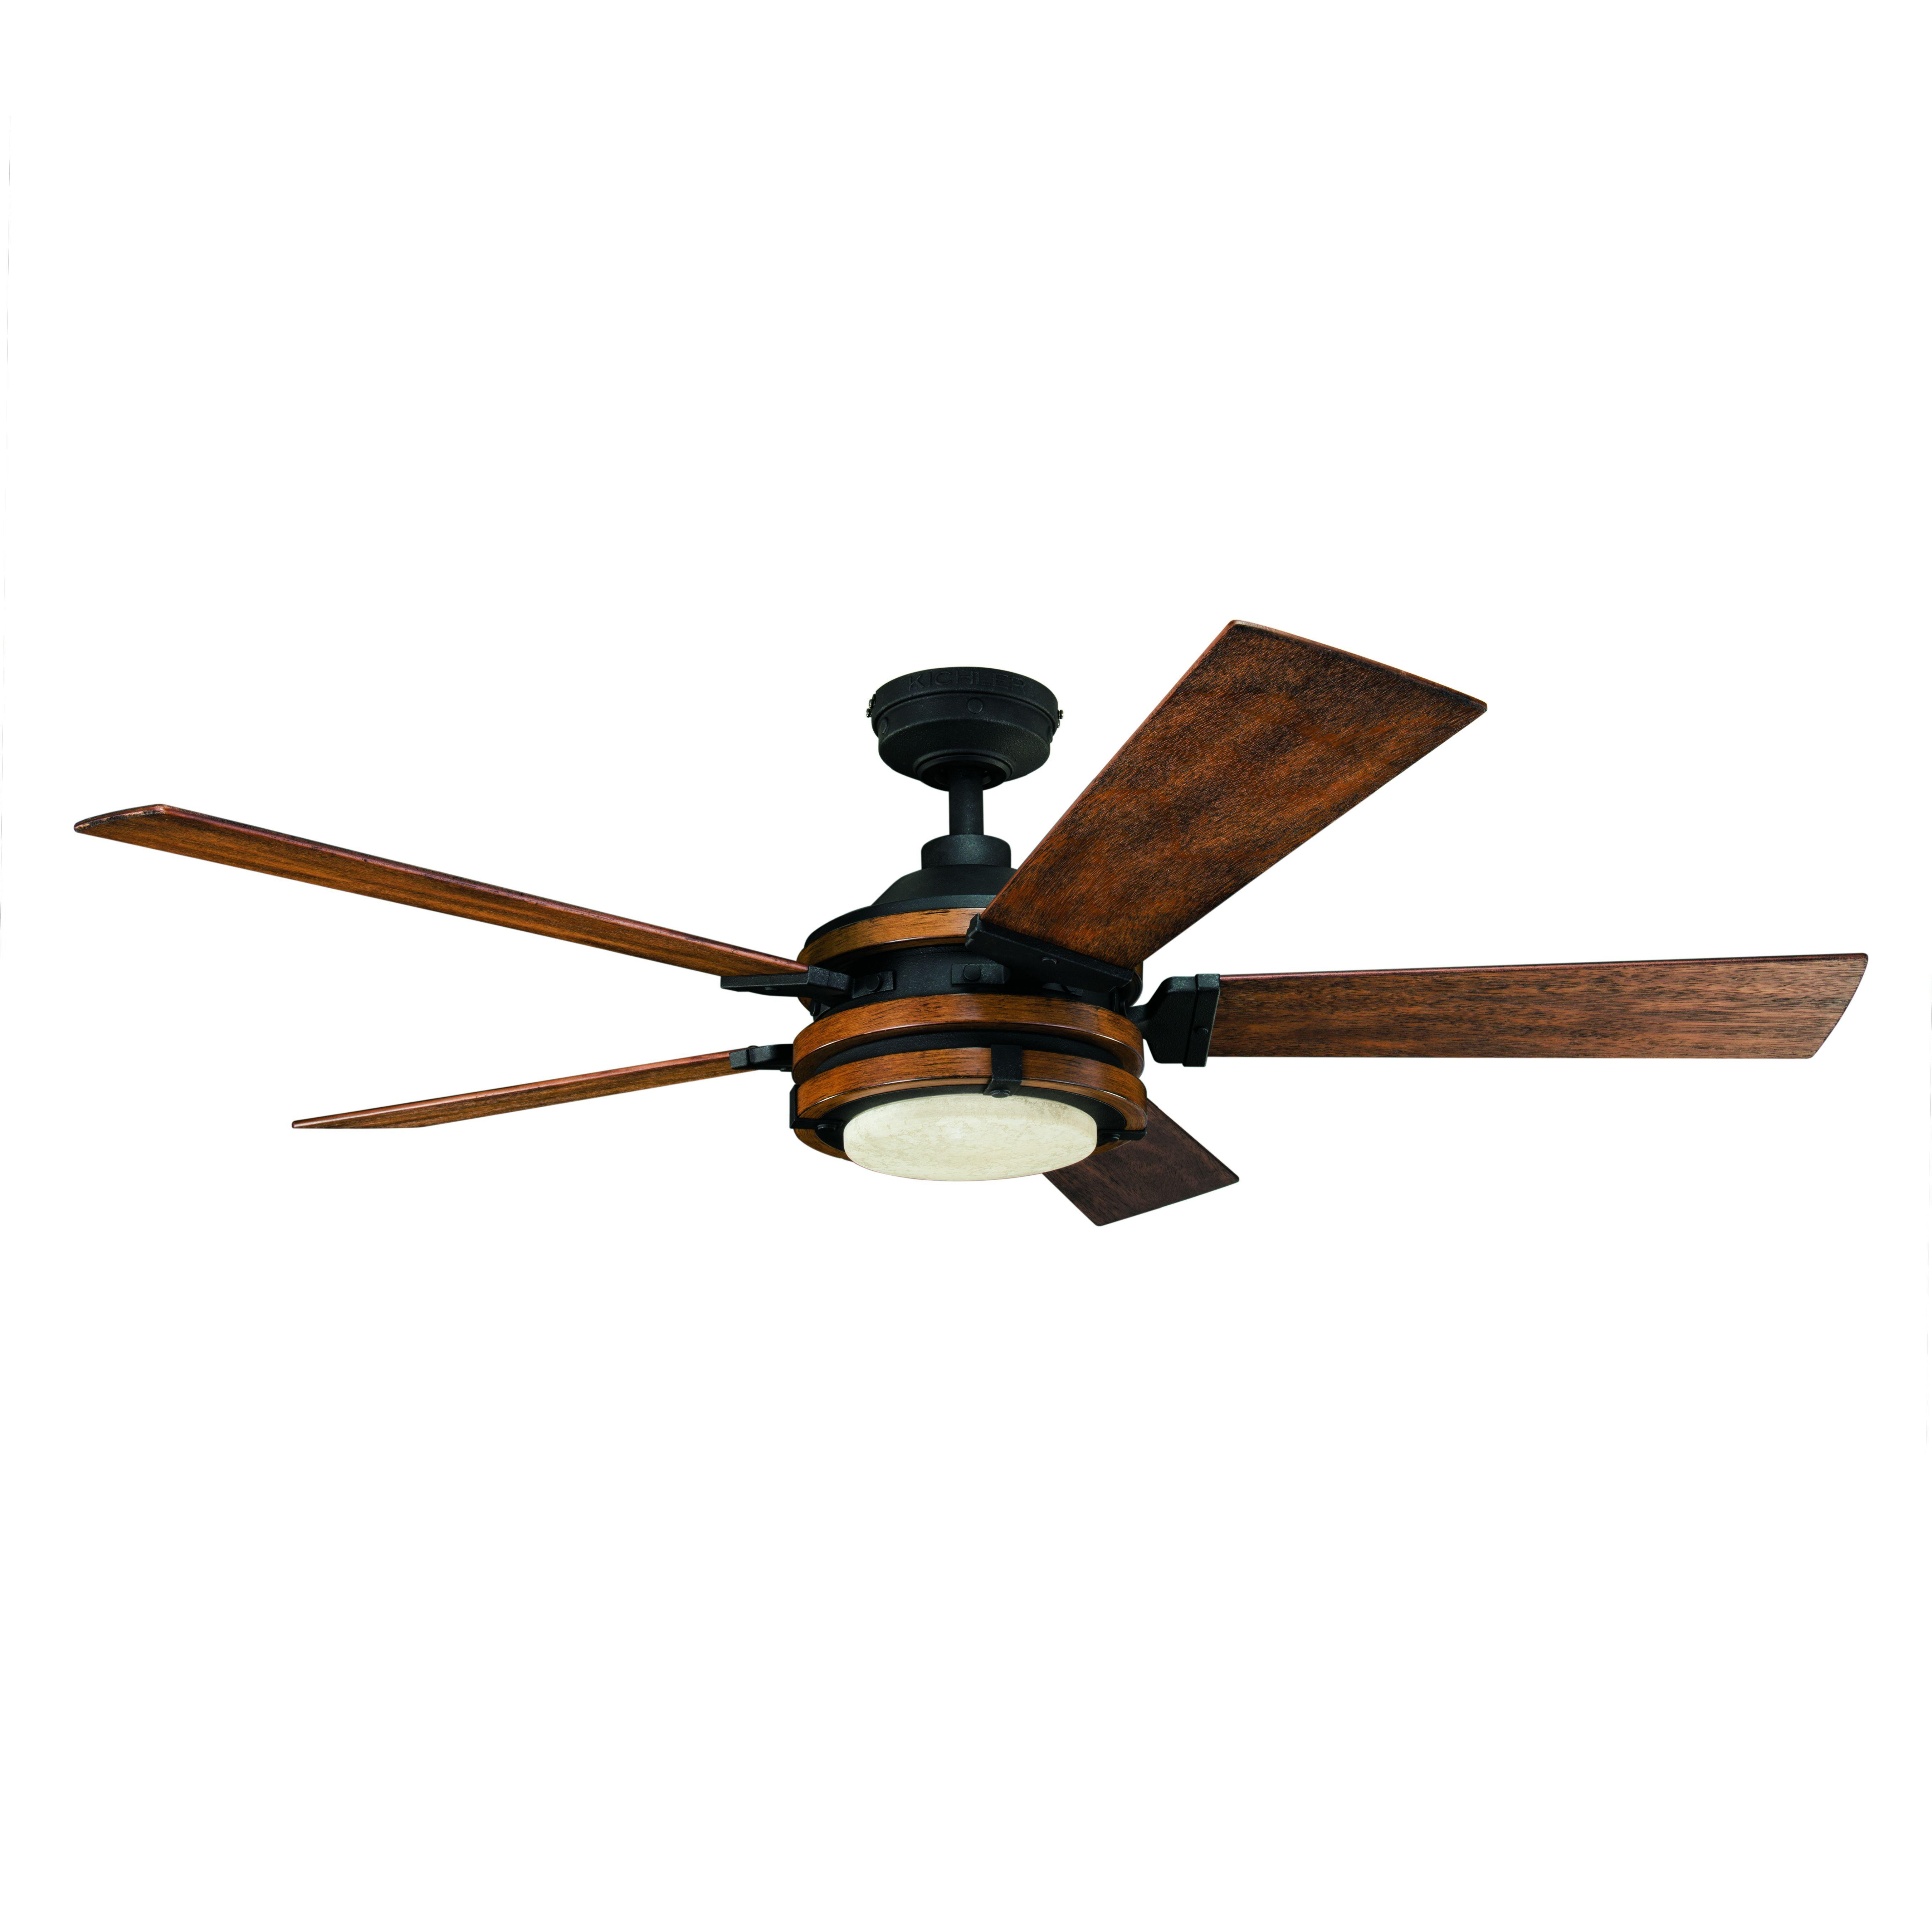 Distressed Black Led Indoor Ceiling Fan